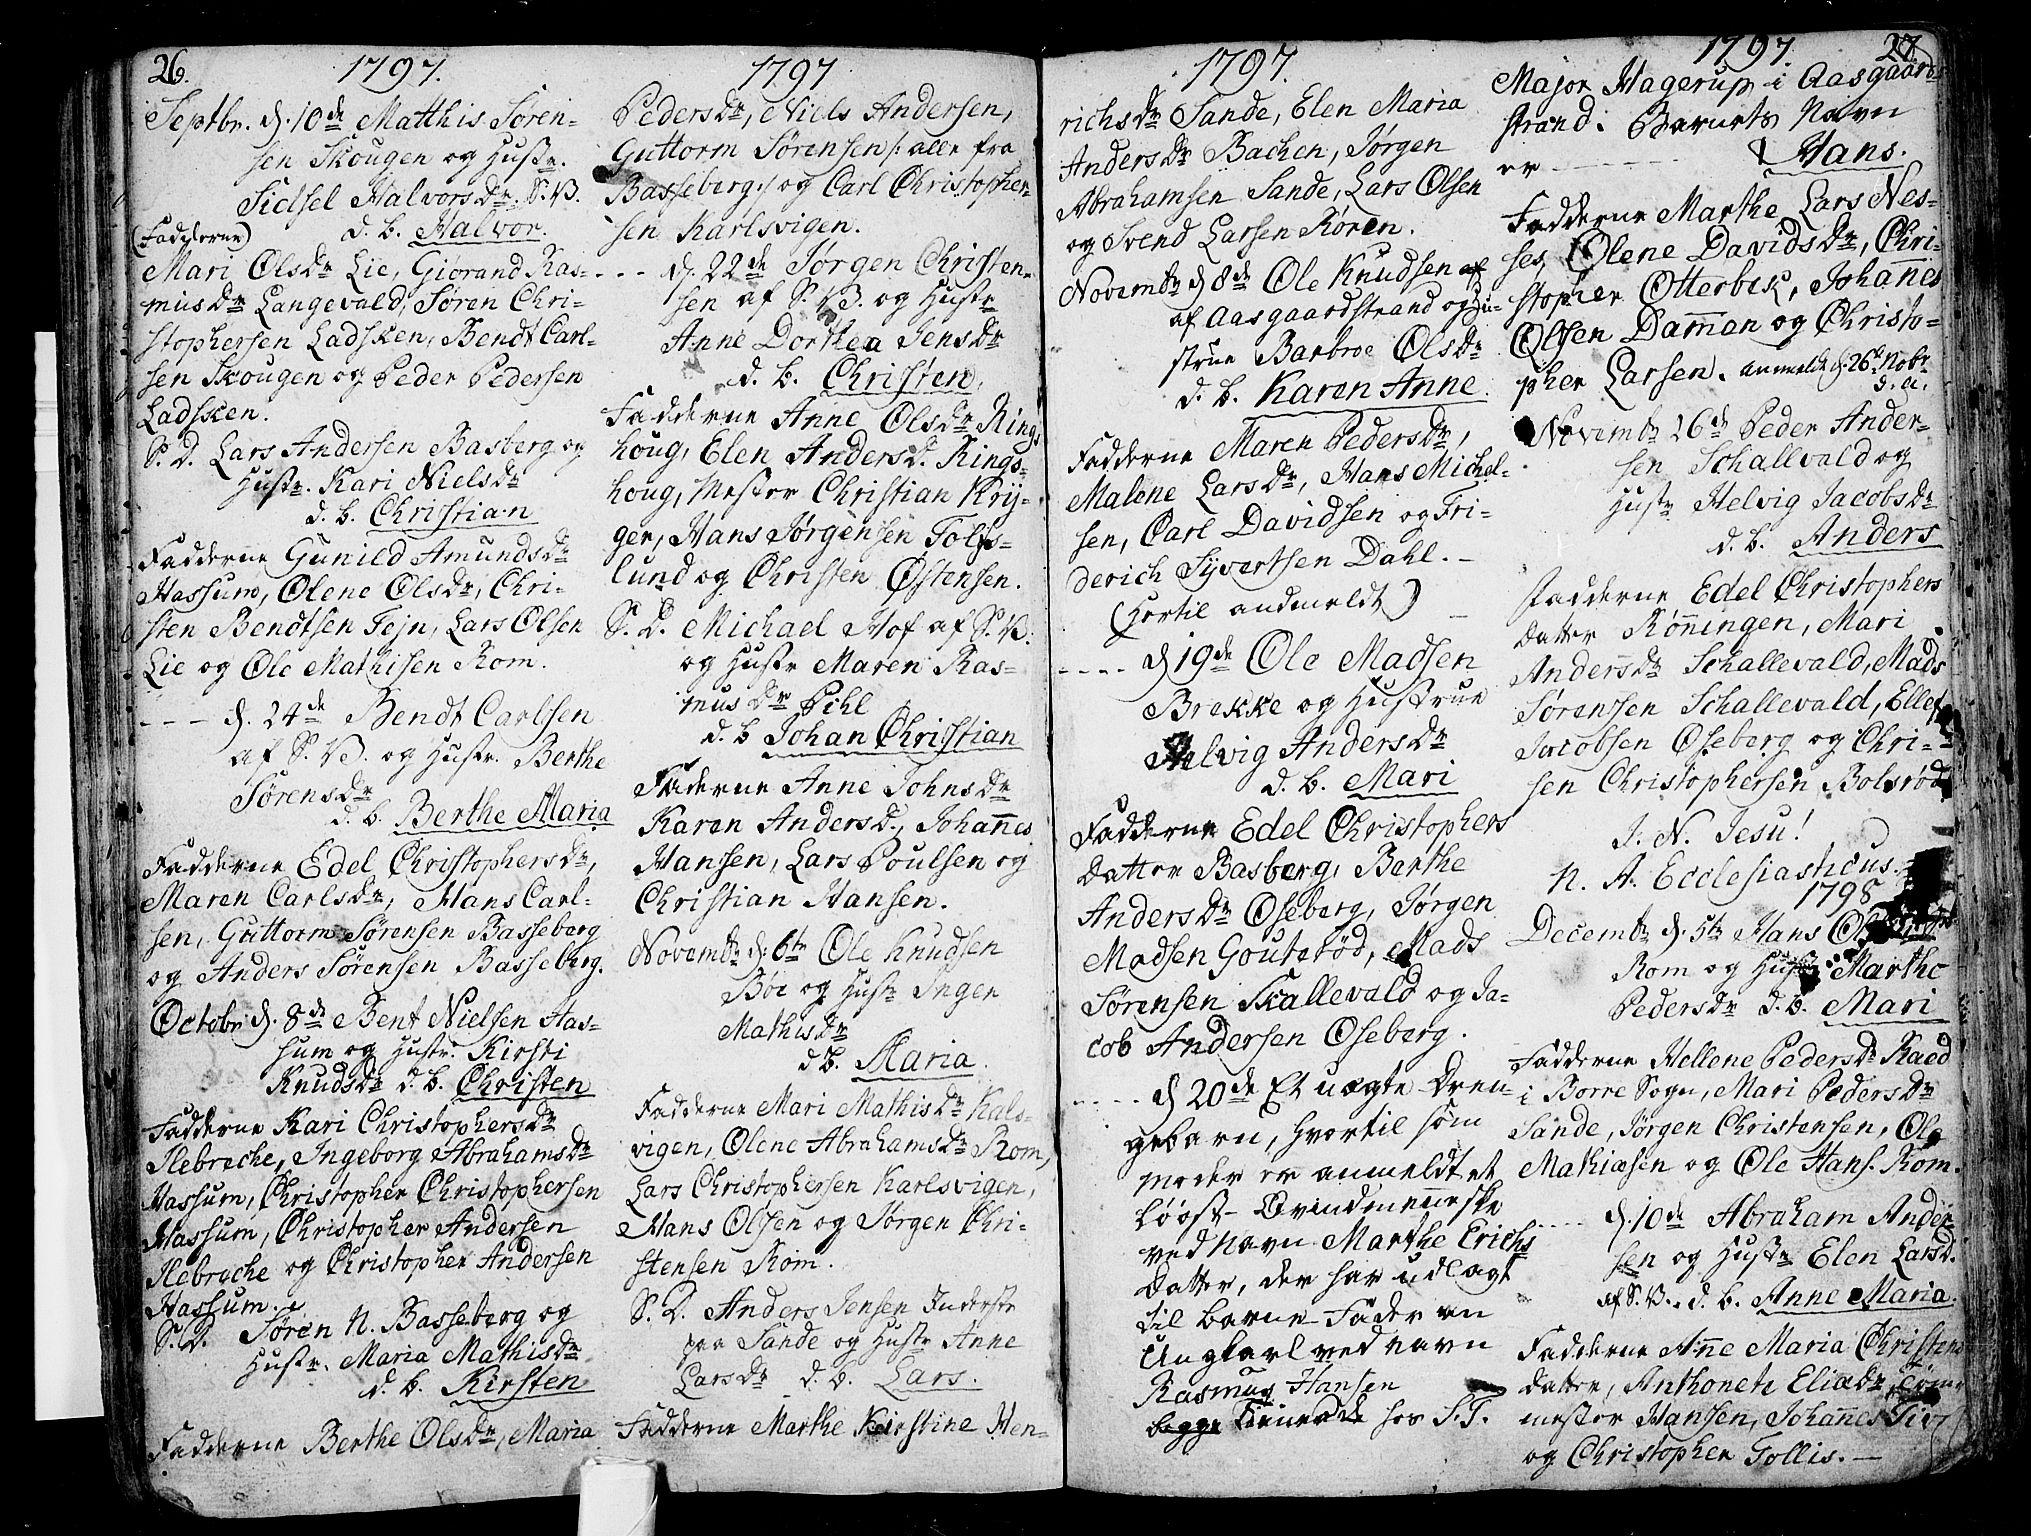 SAKO, Sem kirkebøker, F/Fb/L0003: Ministerialbok nr. II 3, 1792-1814, s. 26-27